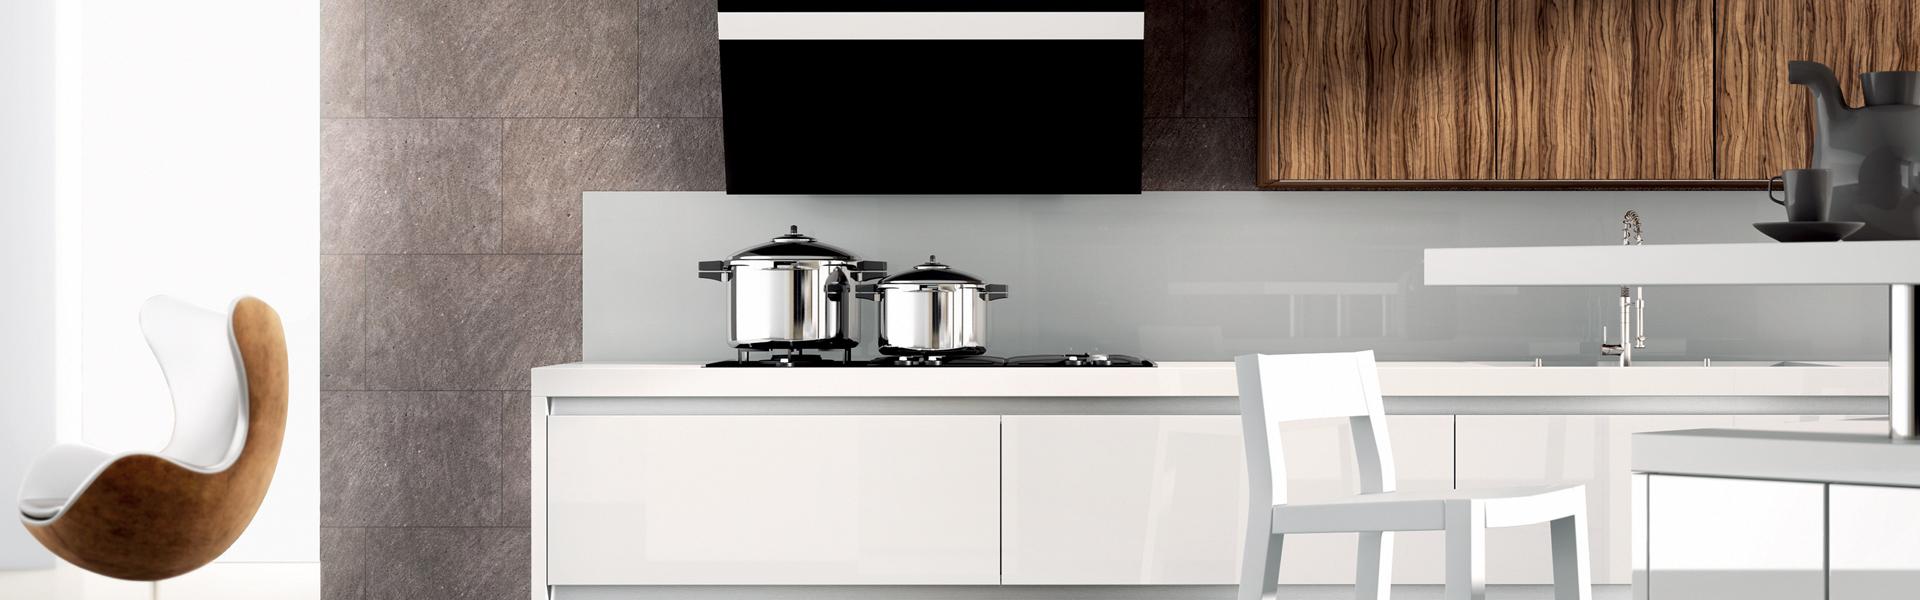 Your dream kitchen appliances sinks taps the gallery for Dream kitchen appliances